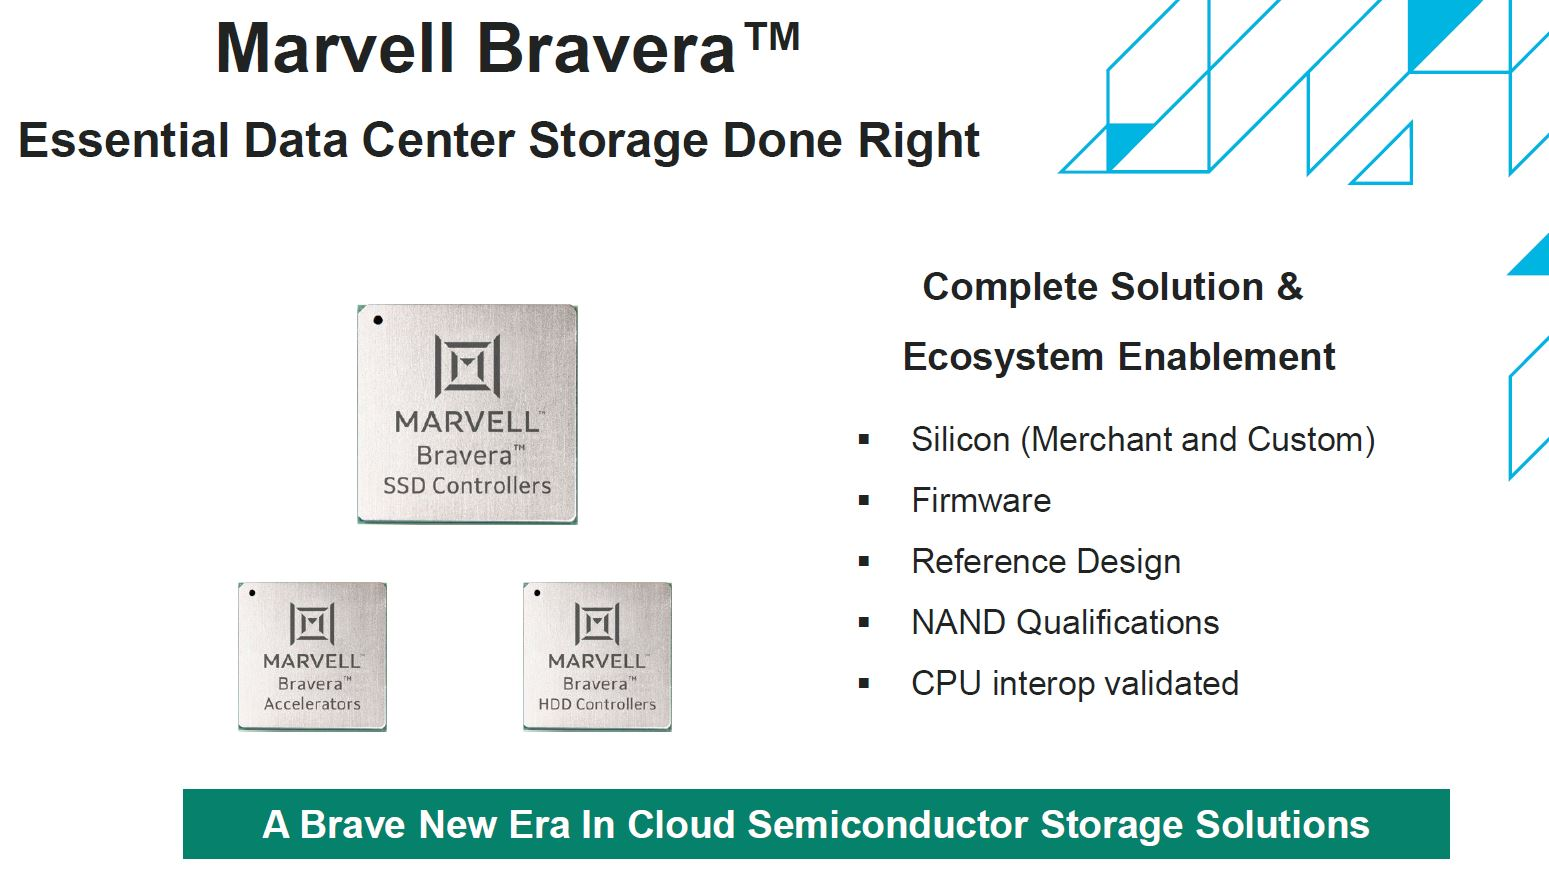 Marvell Bravera Brand Launch